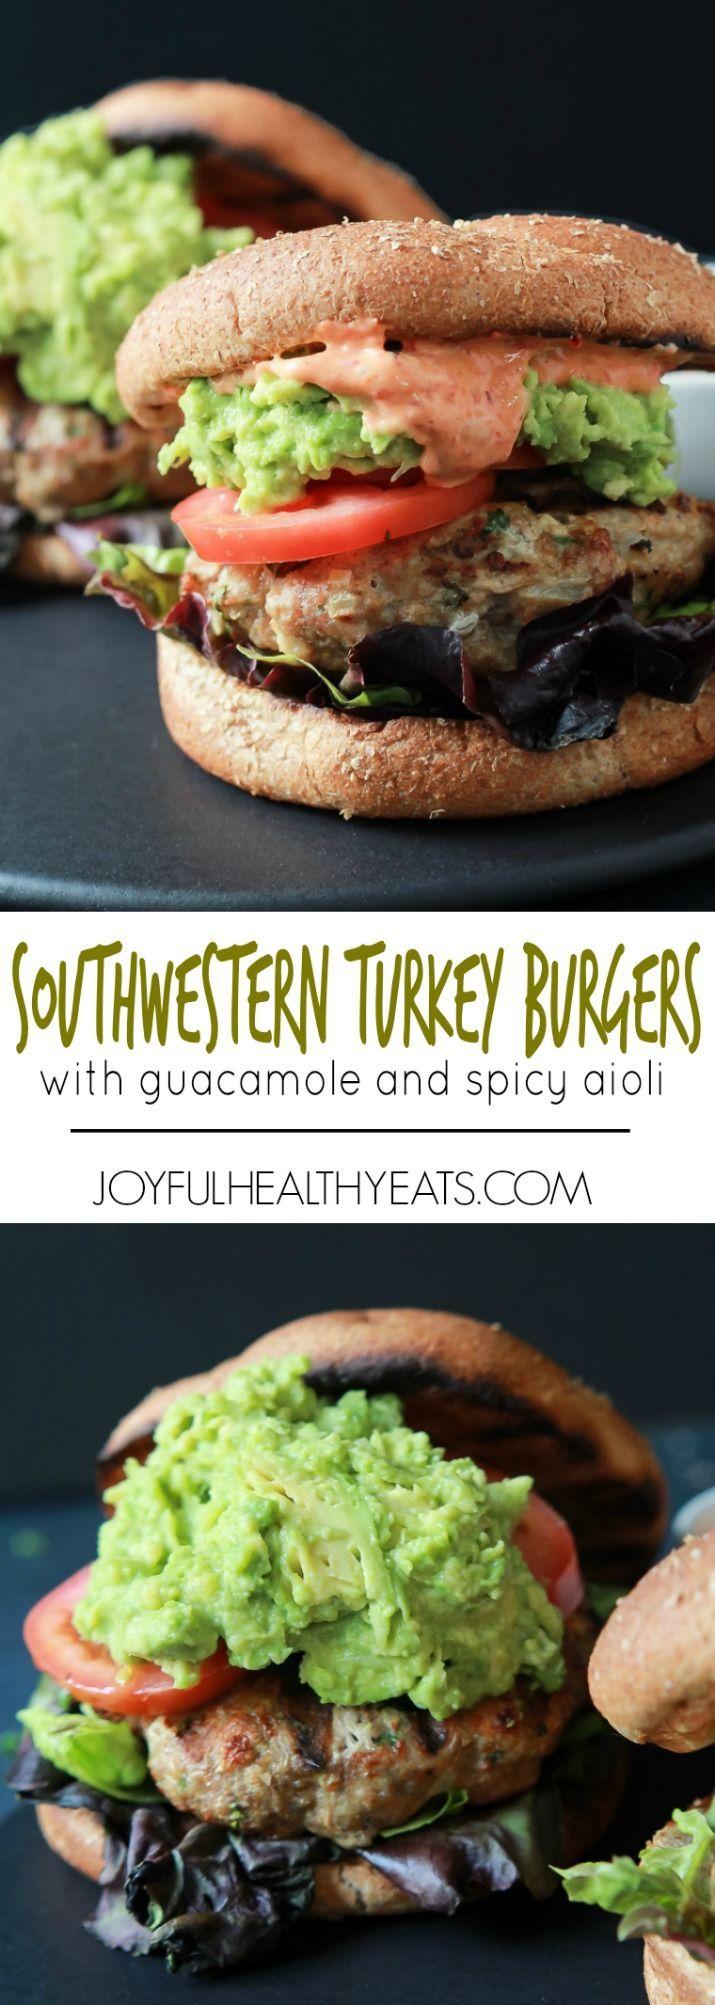 Southwestern Turkey Burgers with Spicy Aioli | Grilled Turkey Burgers